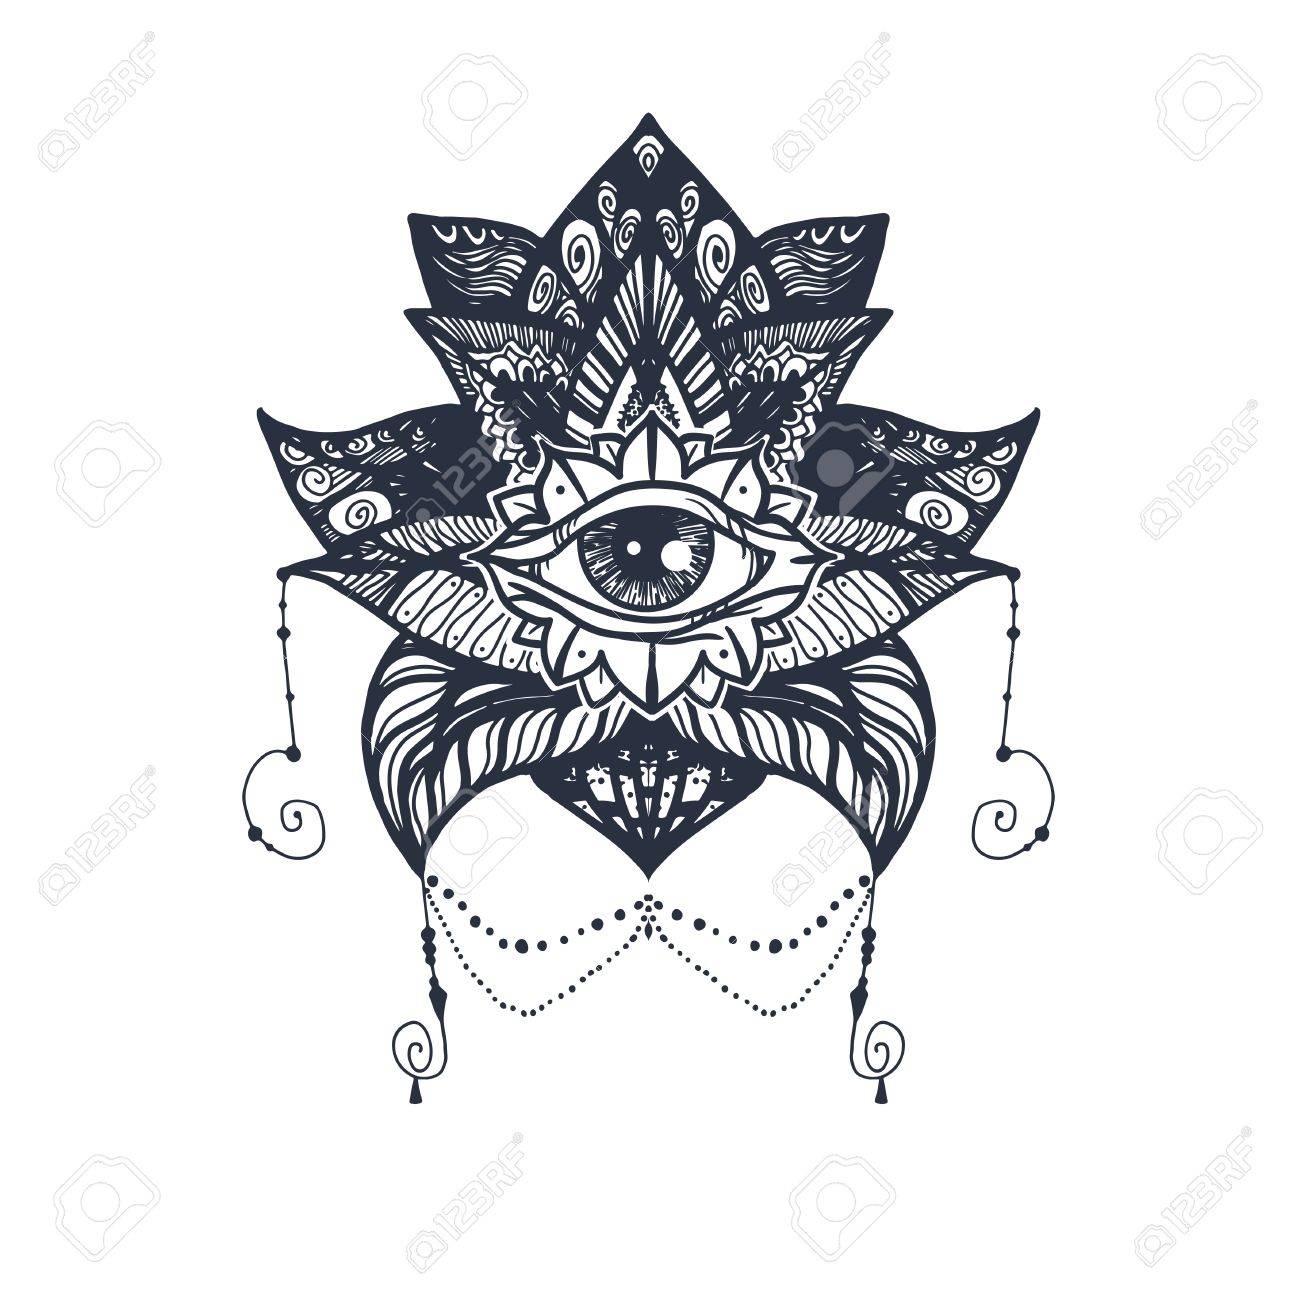 Vintage all seeing eye in mandala lotus providence magic symbol vintage all seeing eye in mandala lotus providence magic symbol for print tattoo buycottarizona